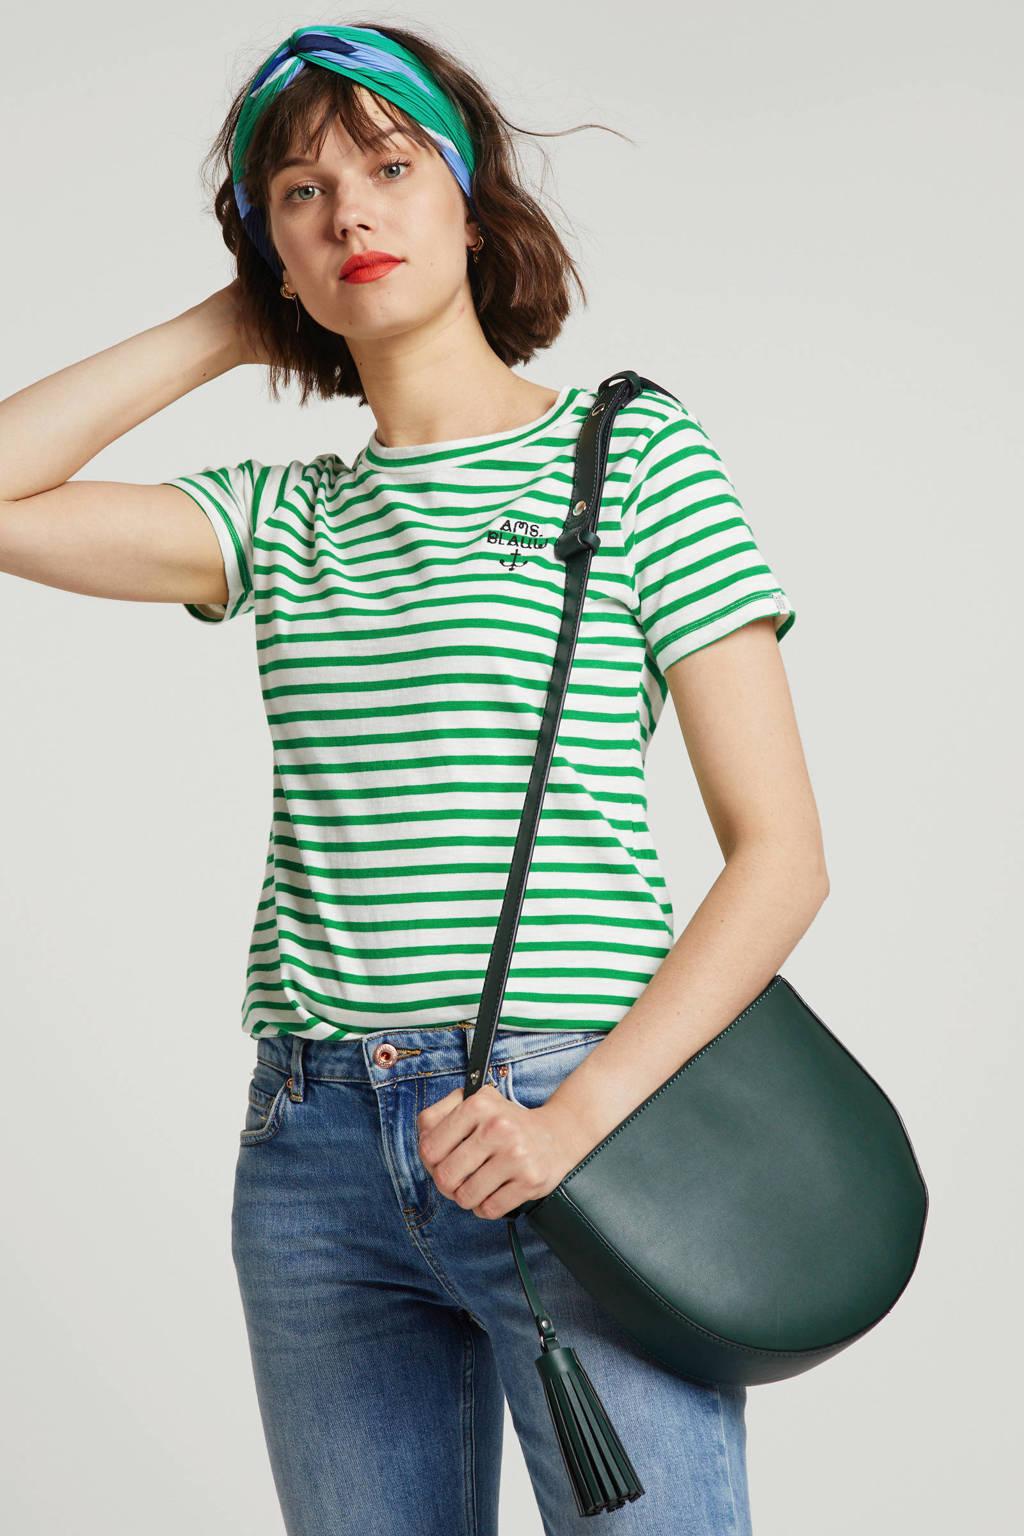 Scotch & Soda gestreept T-shirt groen/ecru, Groen/ecru